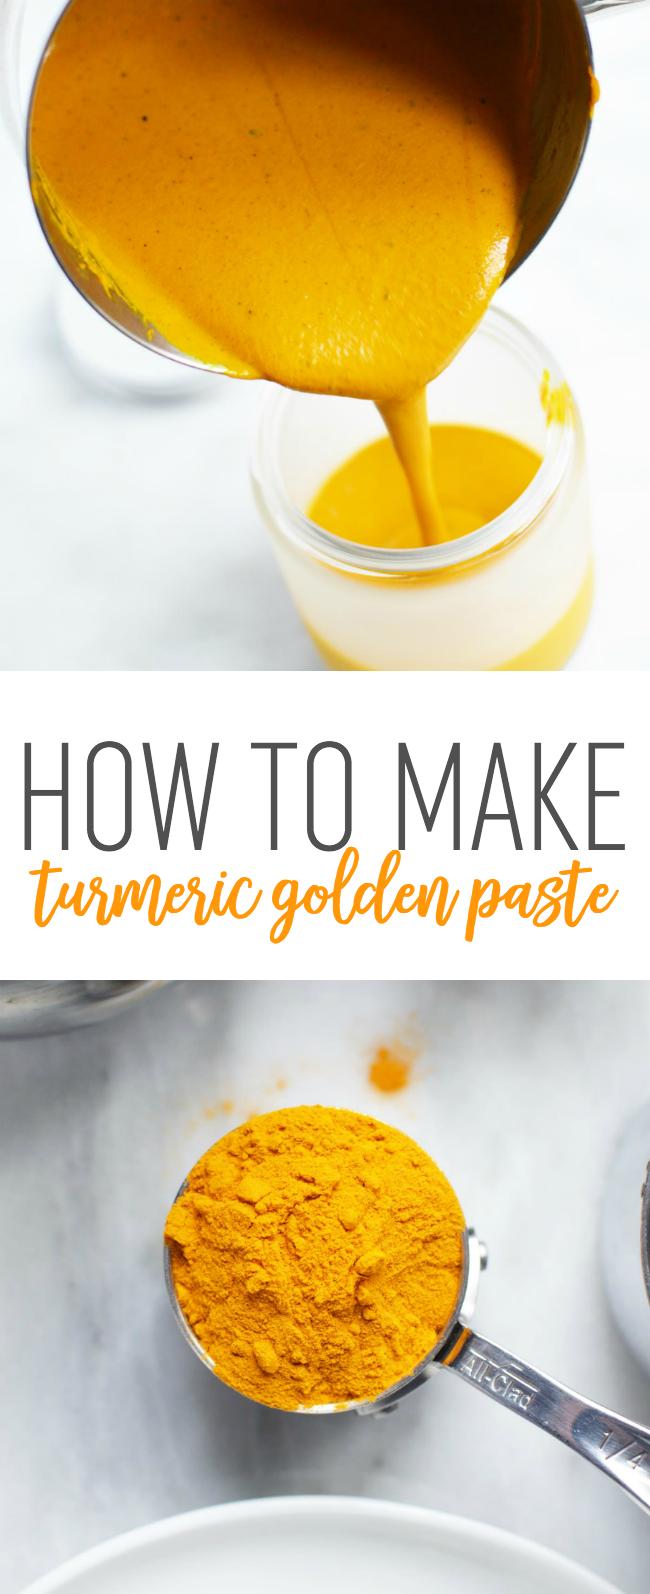 Diy Turmeric Golden Paste Recipe How To Make Golden Paste Used In Golden Milk You Won T Golden Milk Recipe Turmeric Golden Paste Recipe Turmeric Recipes